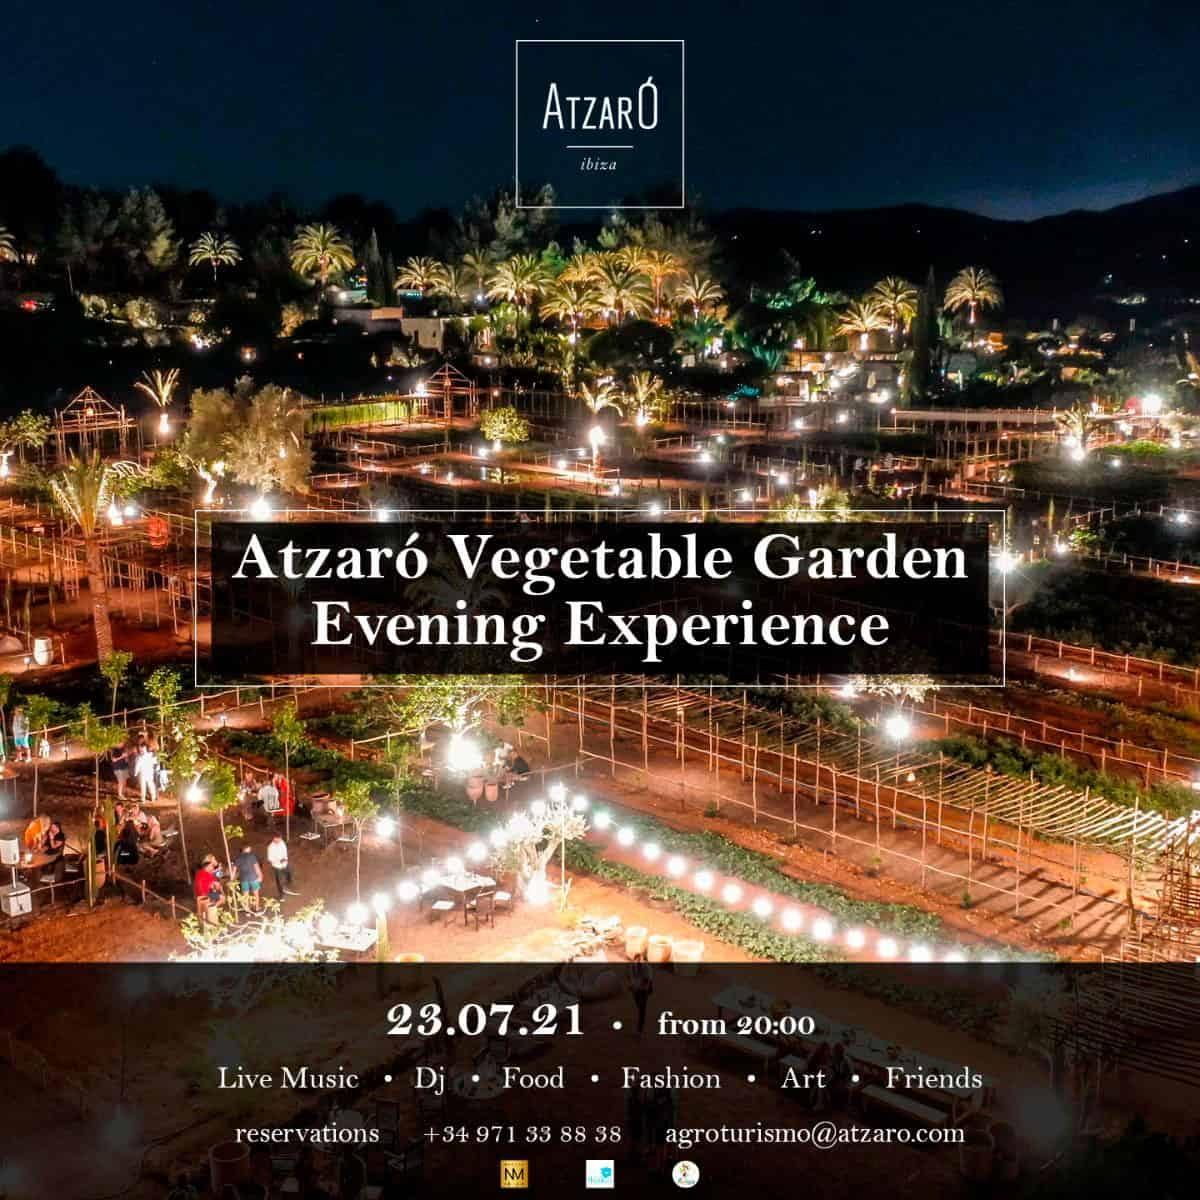 atzaro-vegetable-garden-evening-experience-atzaro-ibiza-huerto-2021-welcometoibiza